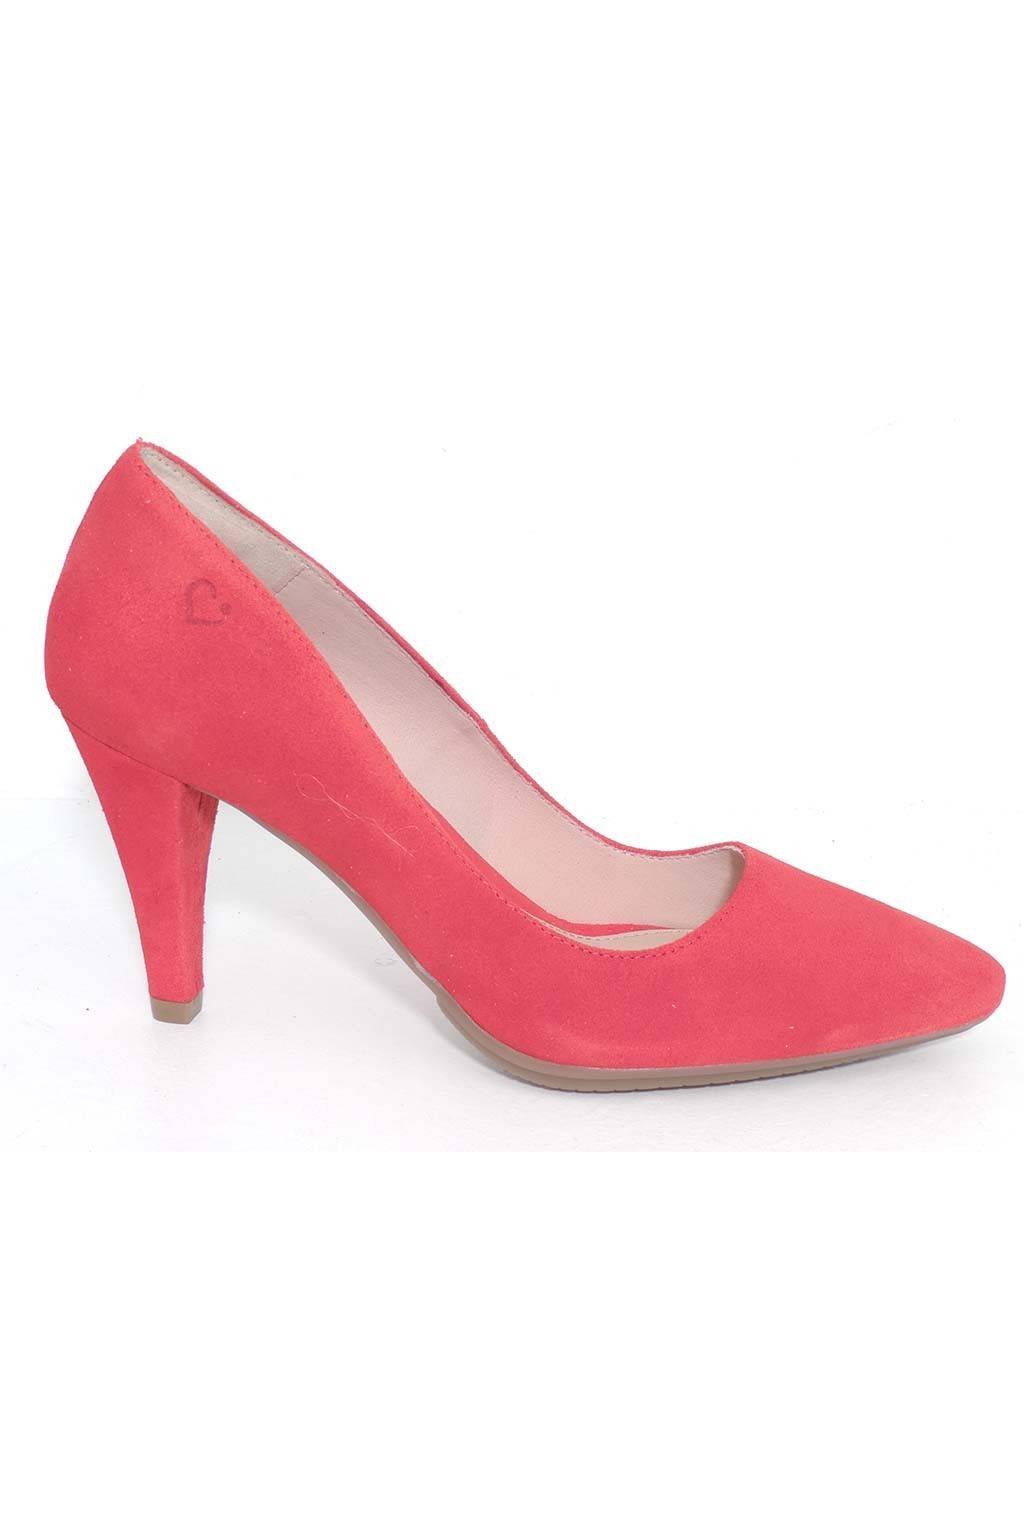 Desiree satur rojo